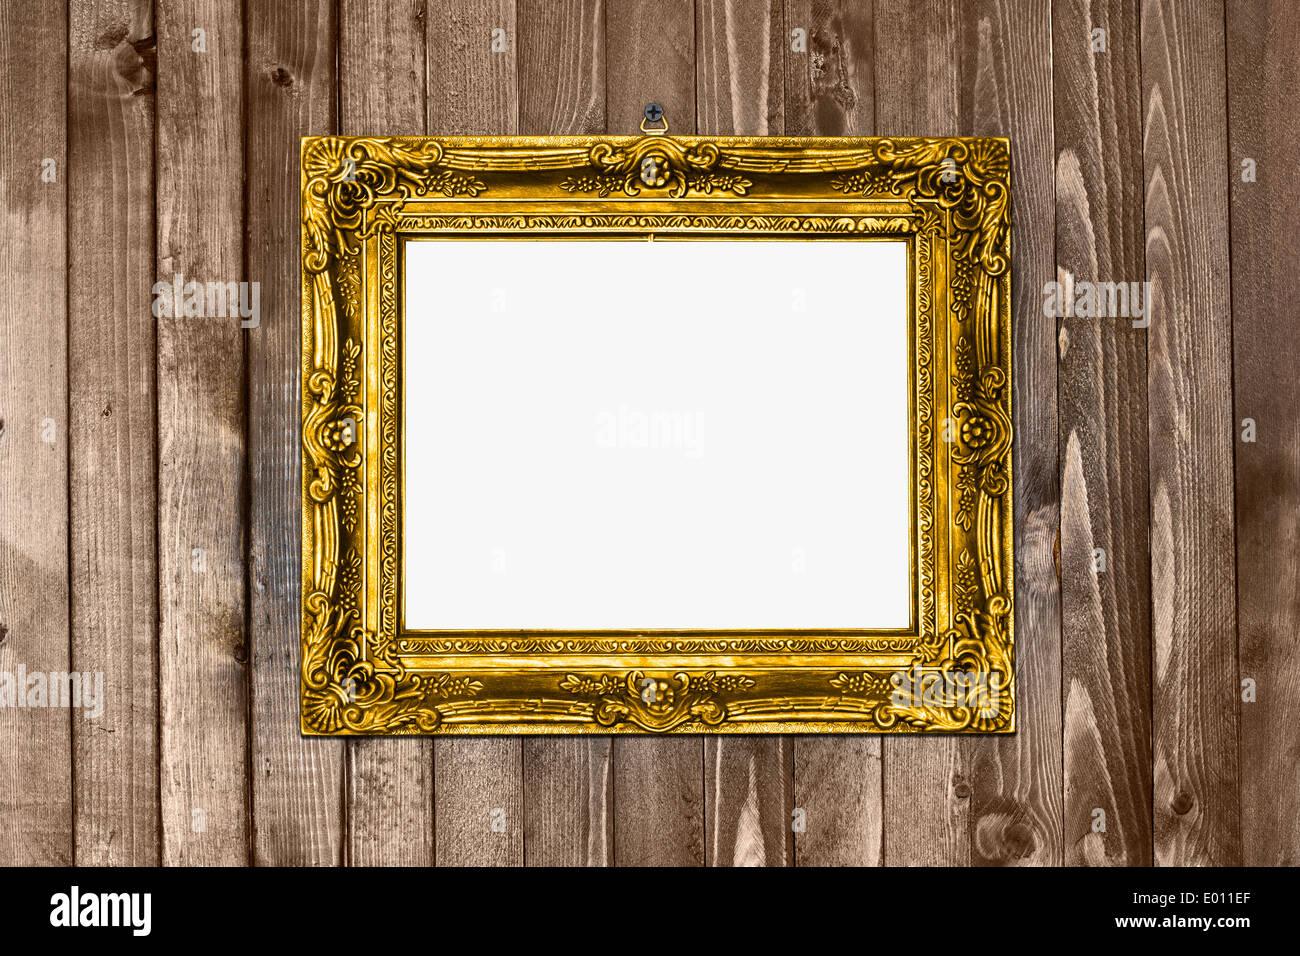 Antike Textur gold Rahmen Holz Wand Muster hängen Stockfoto, Bild ...